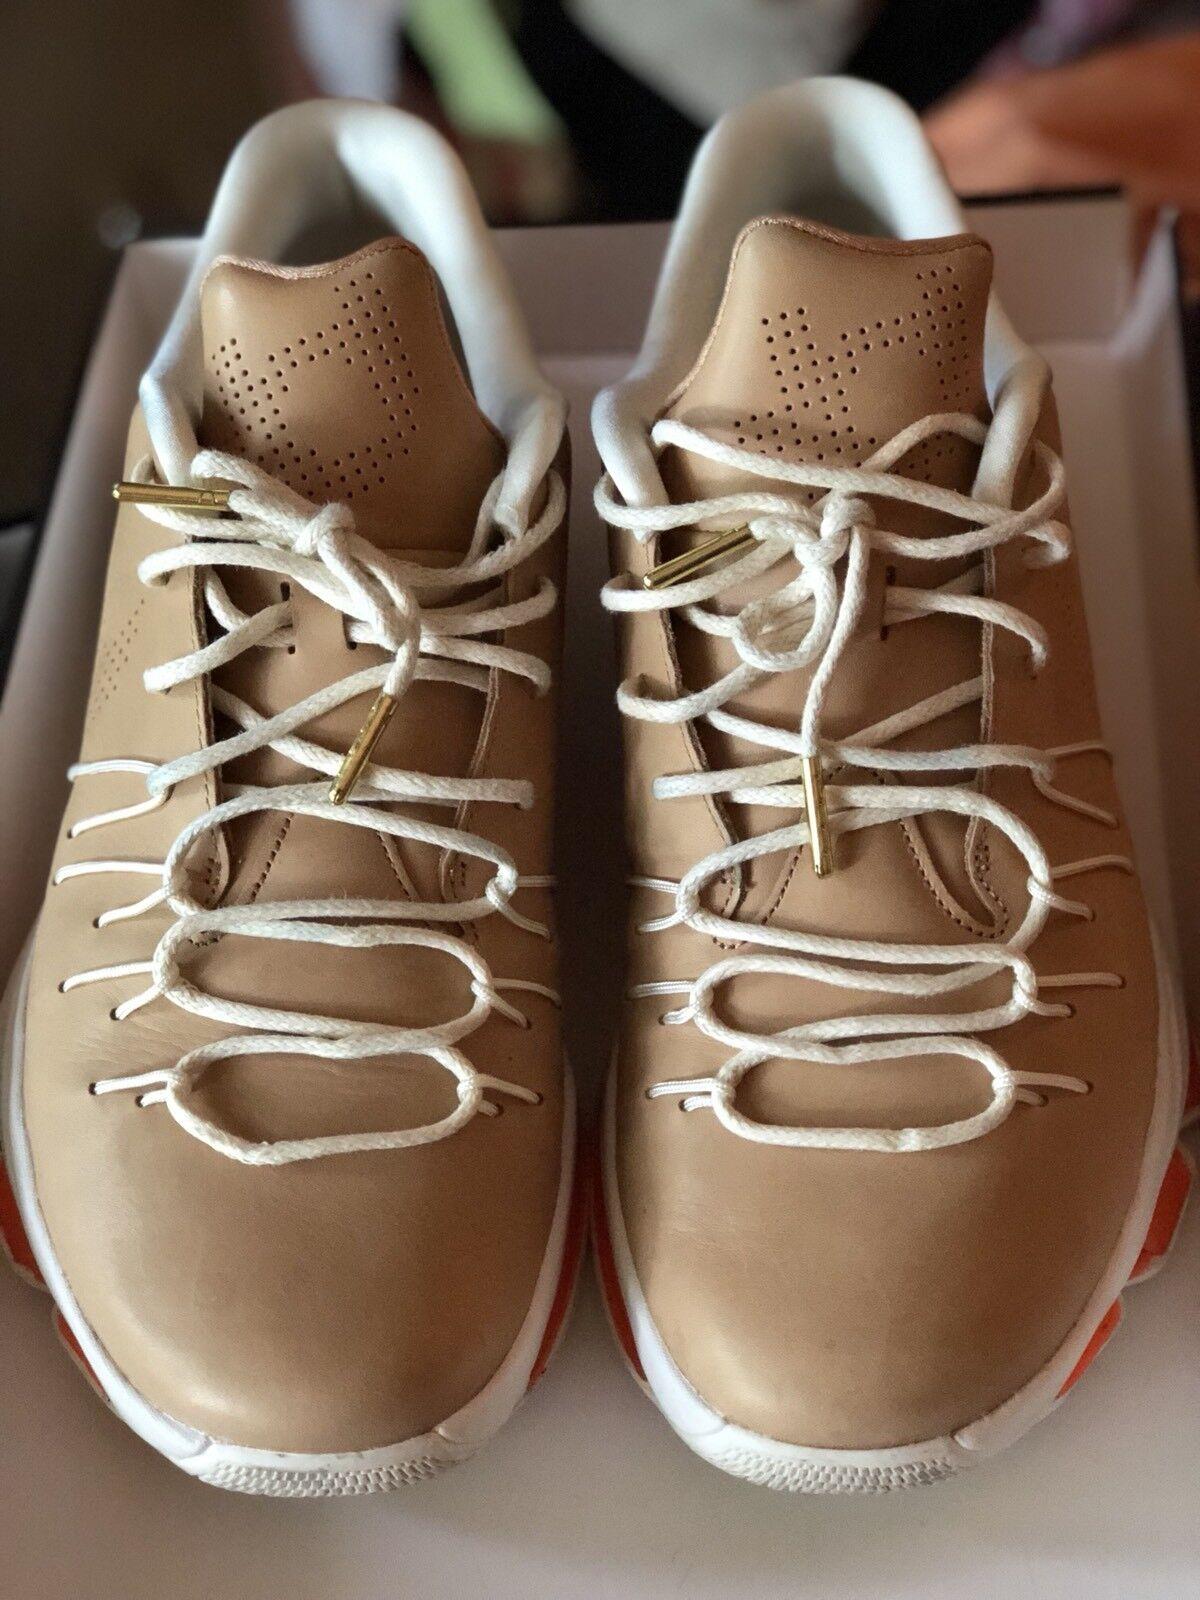 Nike KD 8 EXT Vachetta Tan mens size 10 worn one time